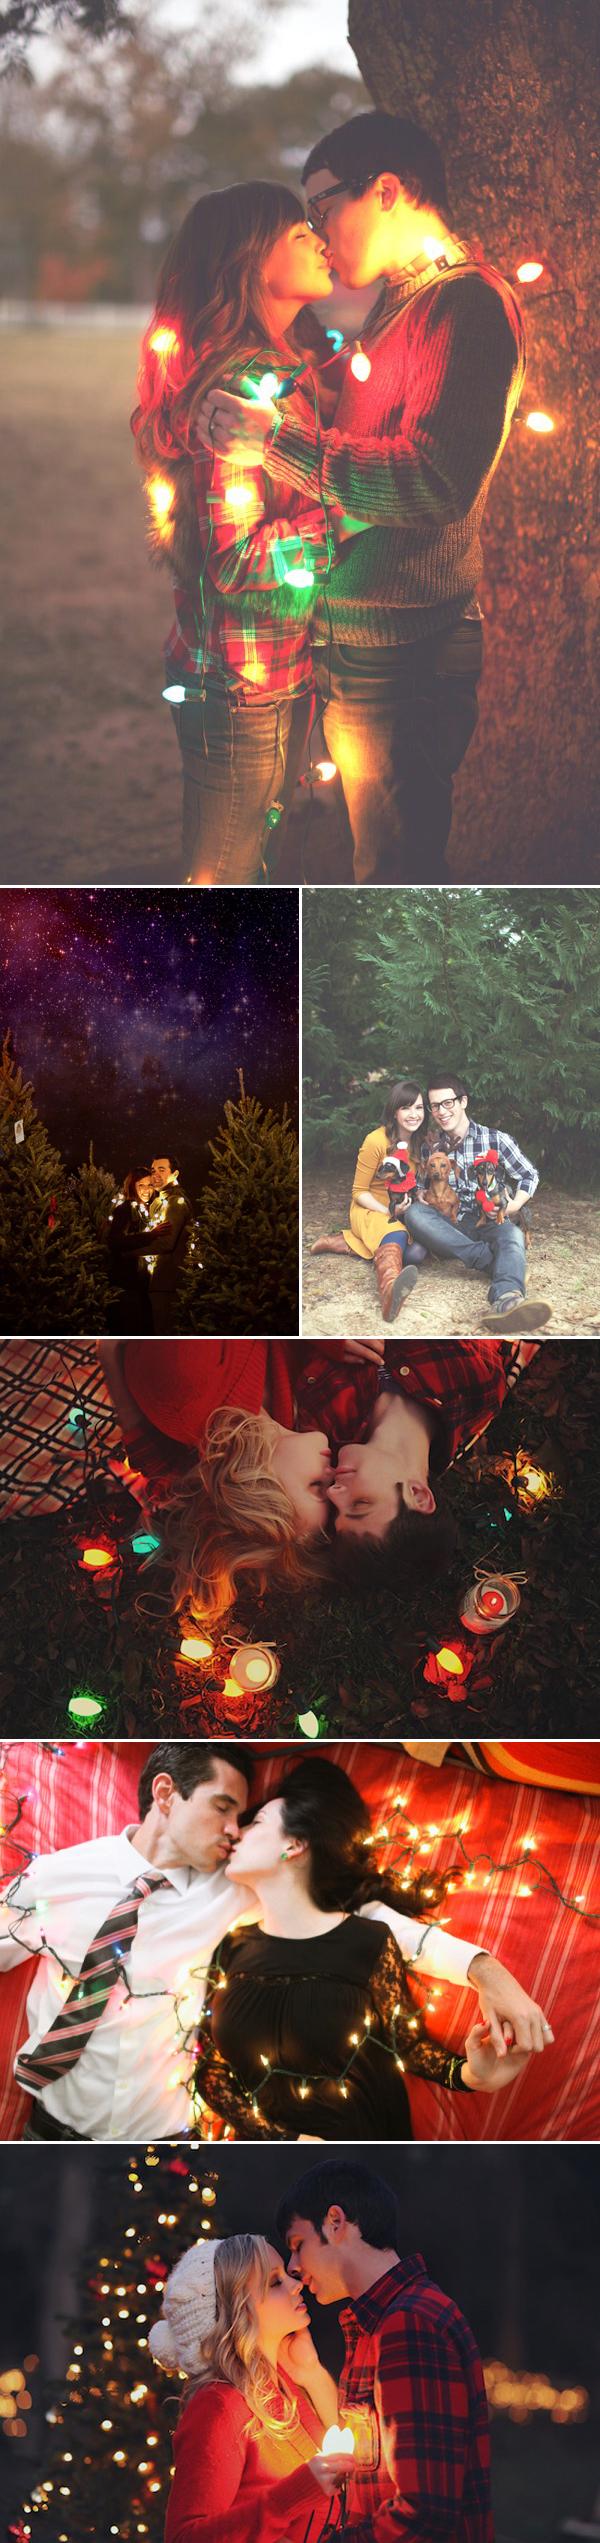 Christmas01-esession